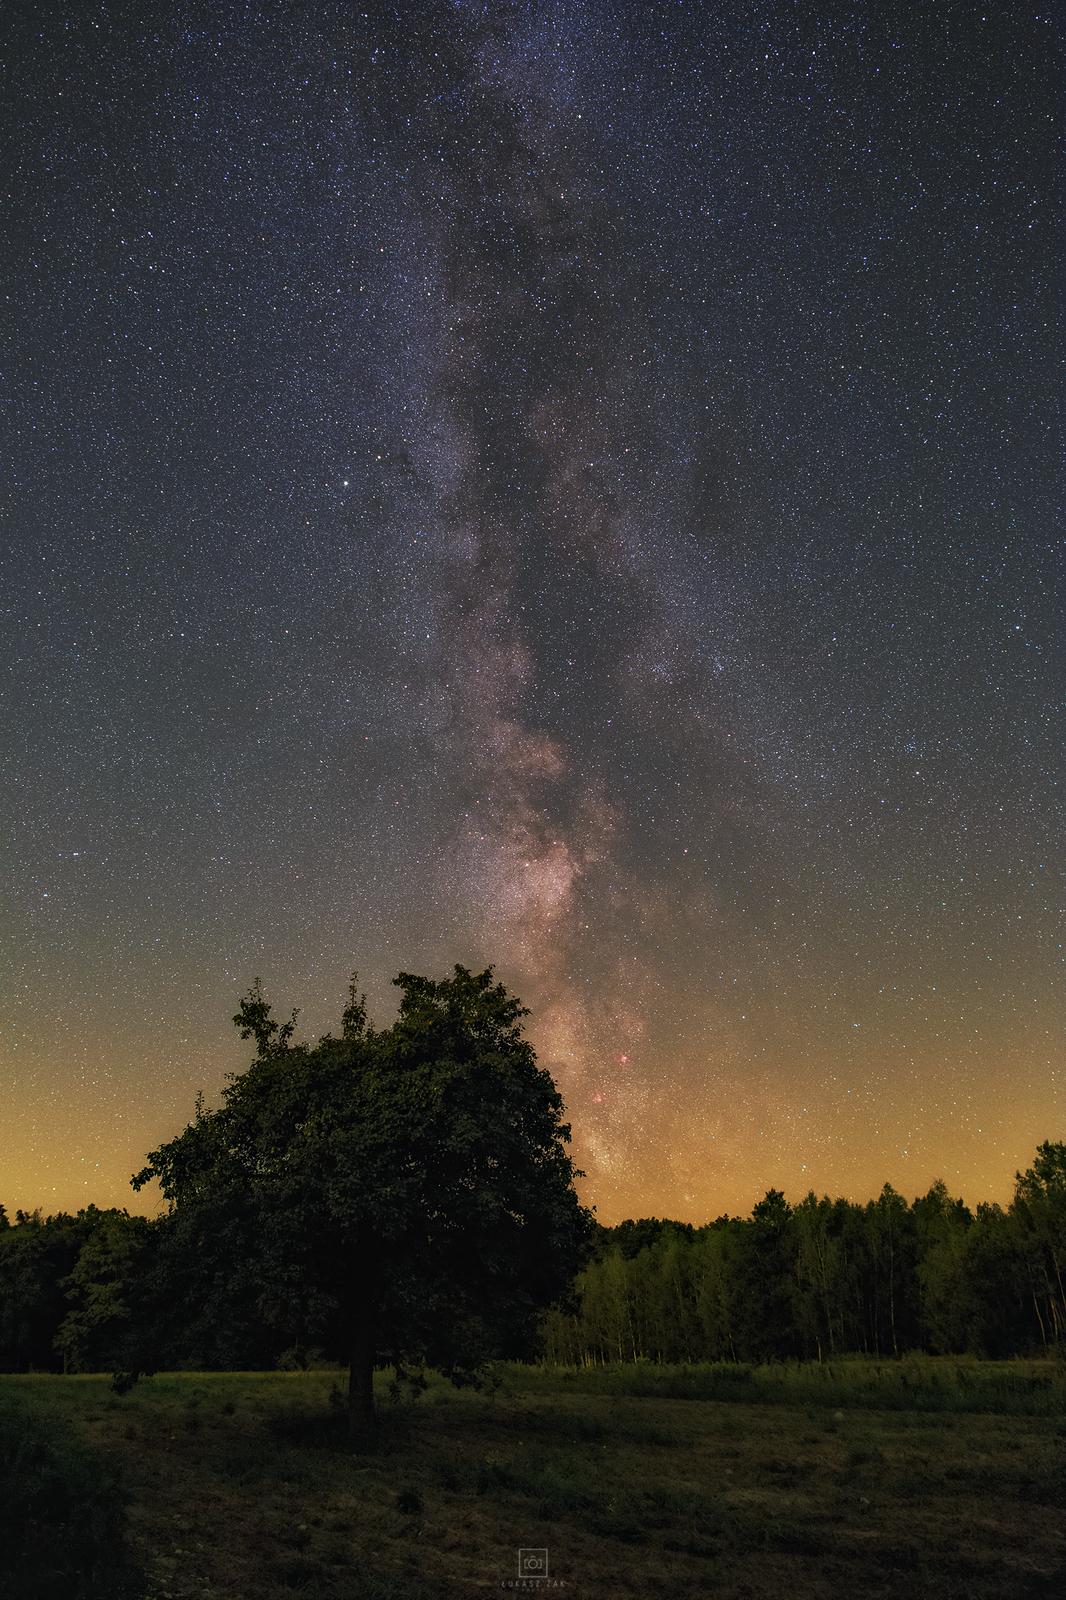 Góra_Puławska_Milky_Way_24_08_2019_2.png